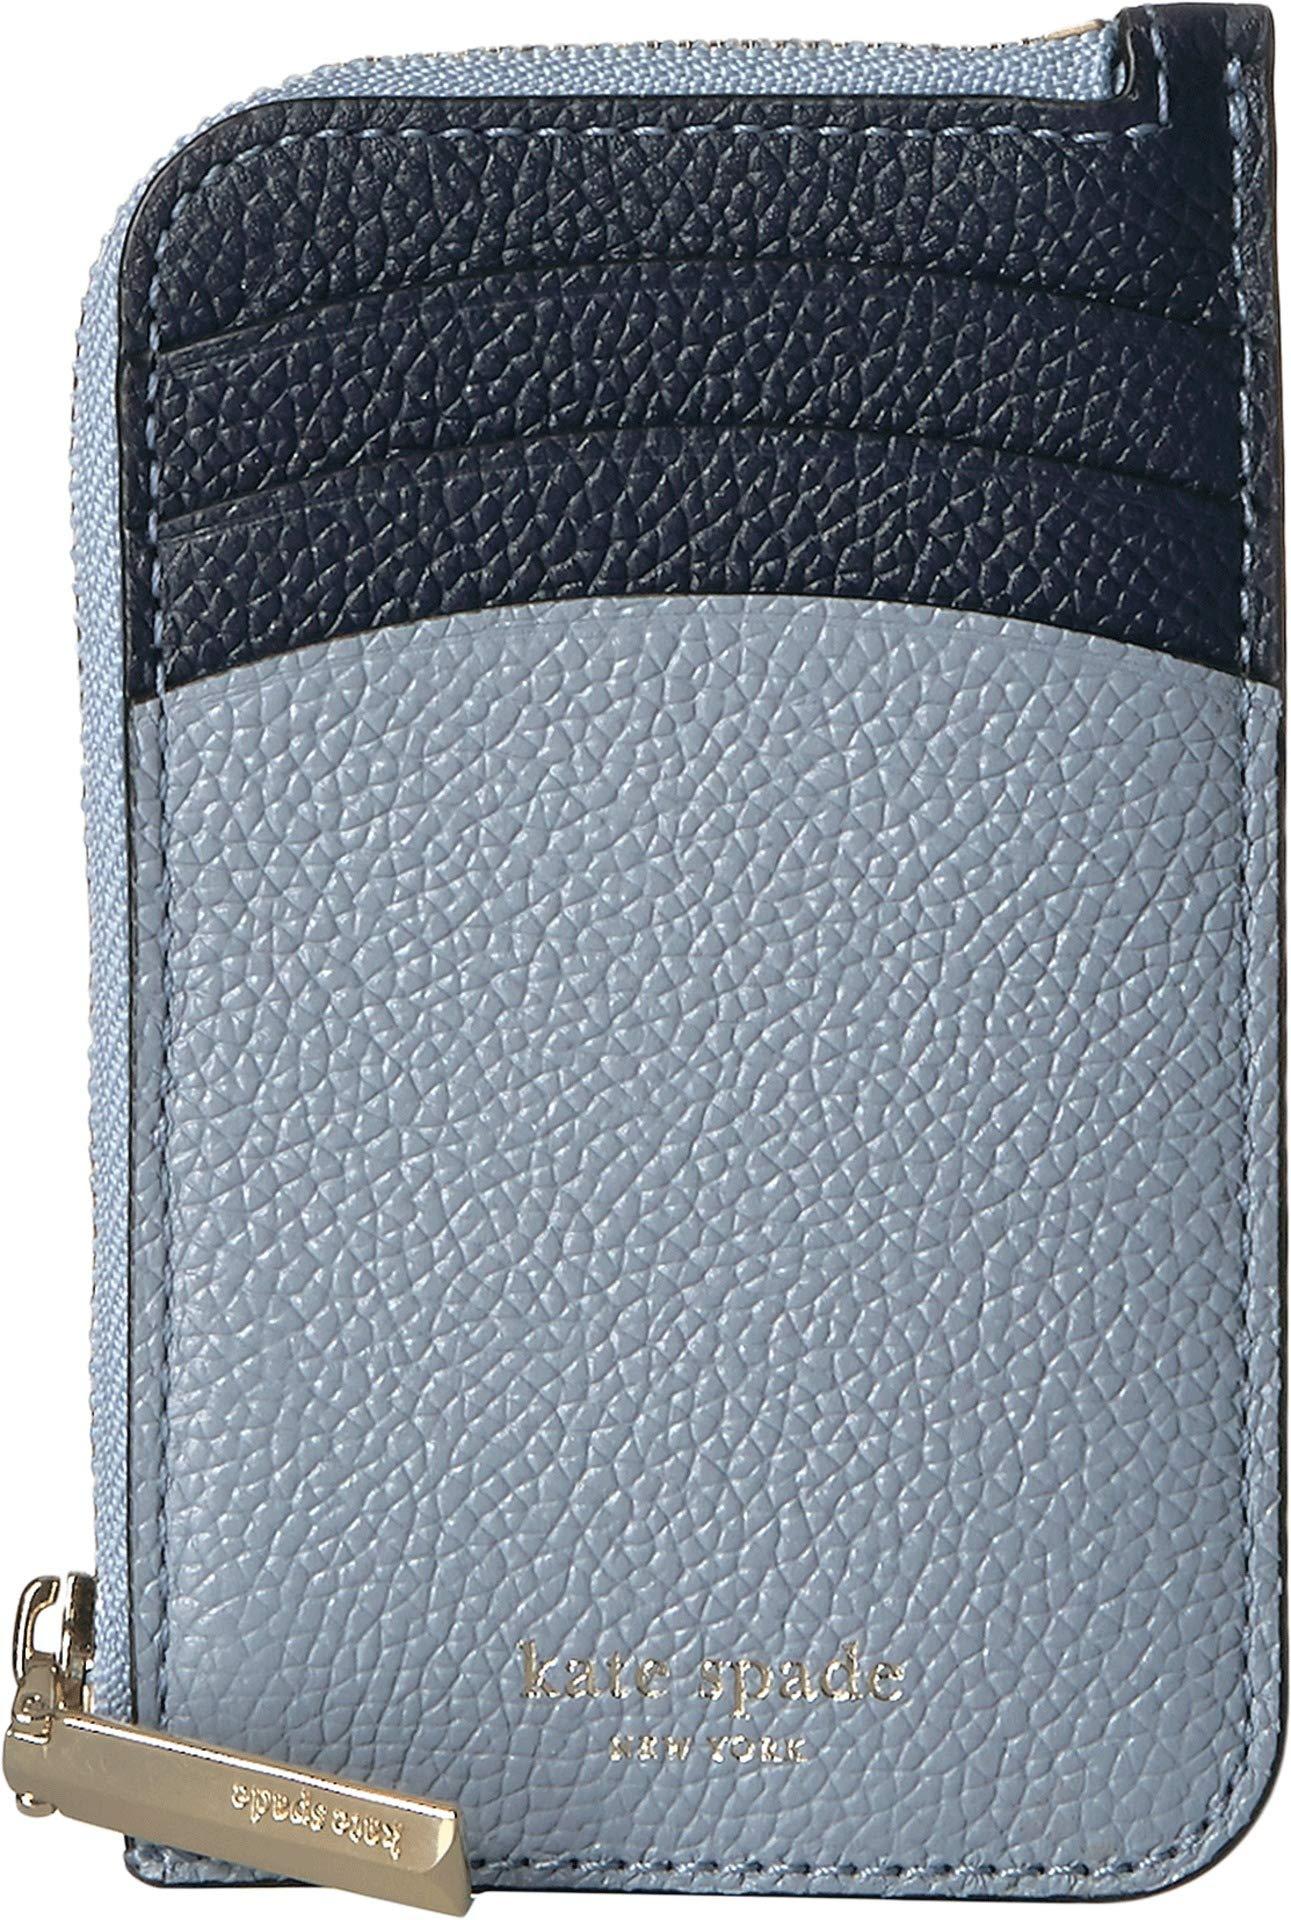 Kate Spade New York Women's Margaux Zip Card Holder Horizon Blue Multi One Size